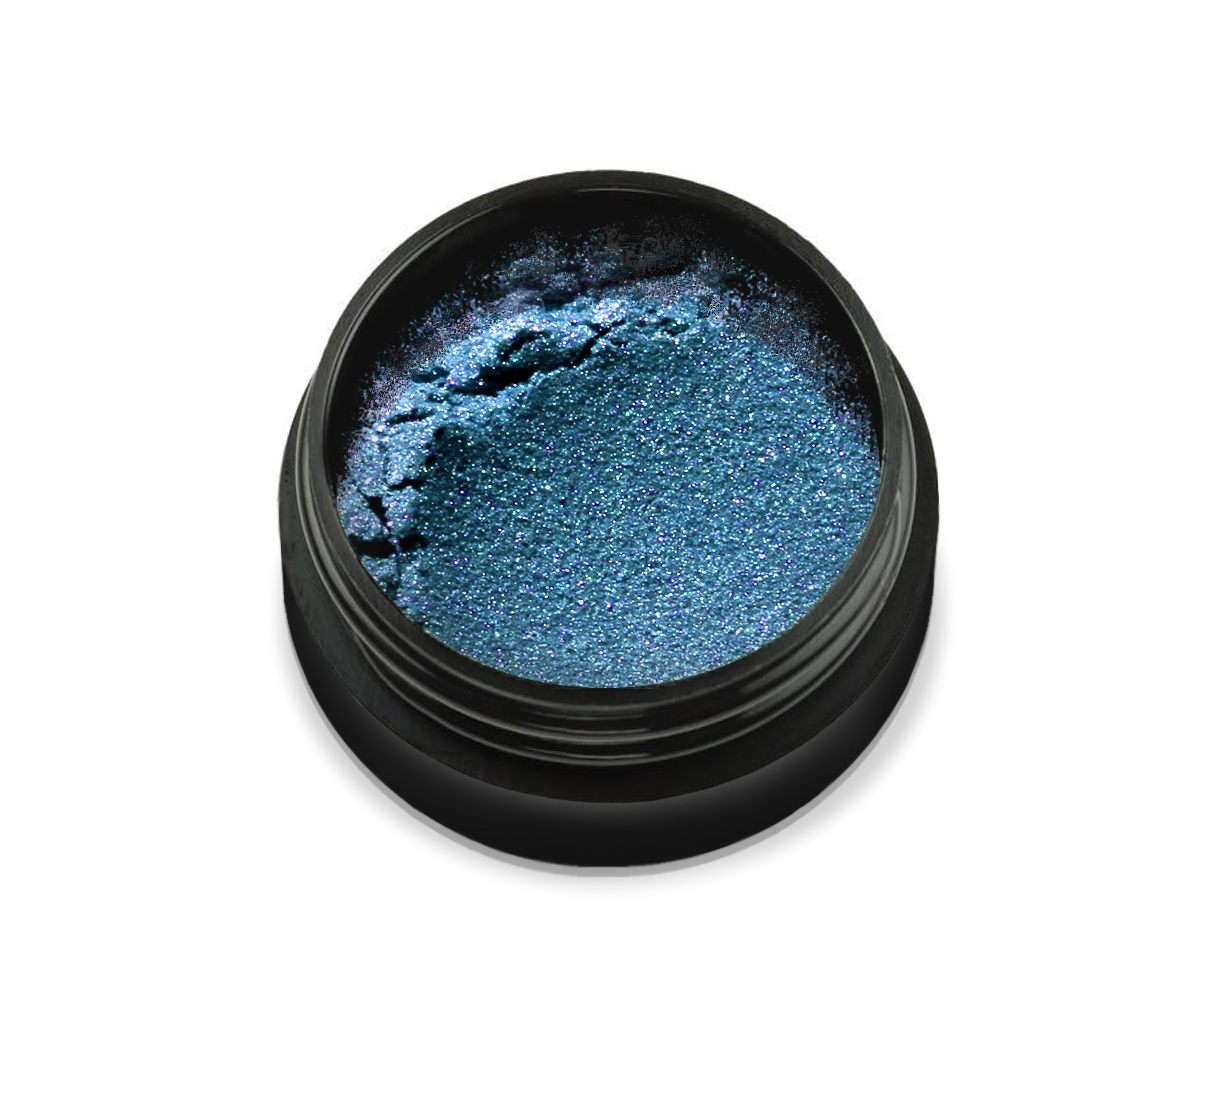 "6040 Pudra cu pigmenti 'Didier Lab"", ocean blue 2,5g/Pigment powder 'Didier Lab"", ocean blue"